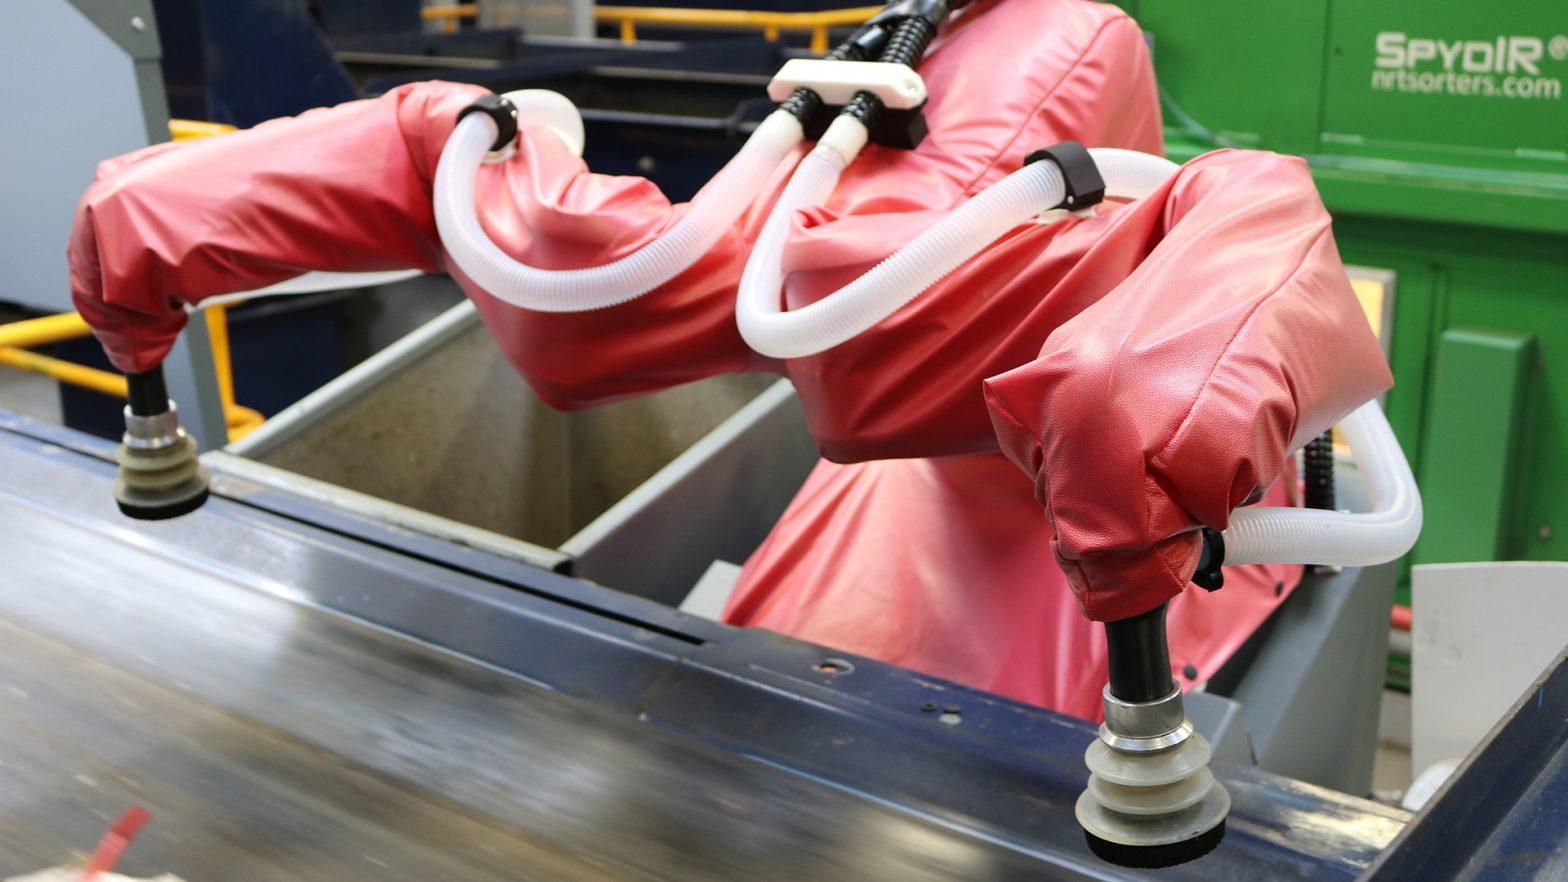 ABB YuMi Robot Robosuit